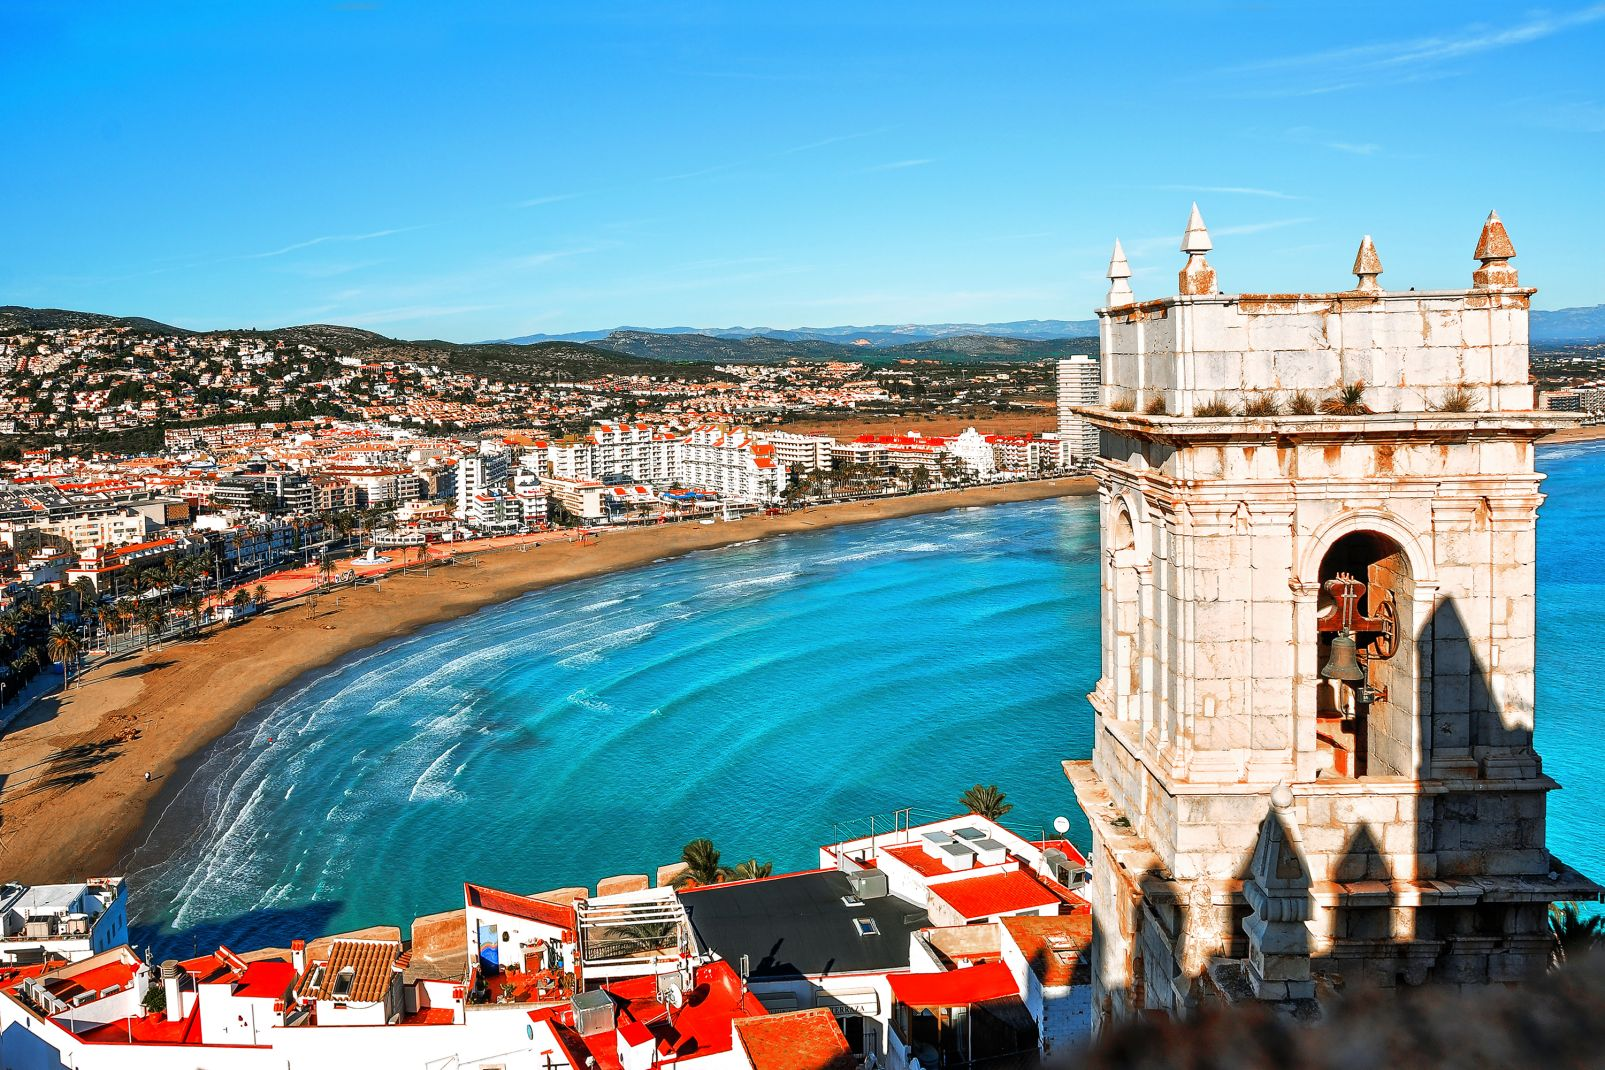 Comunità valenzana, Spagna